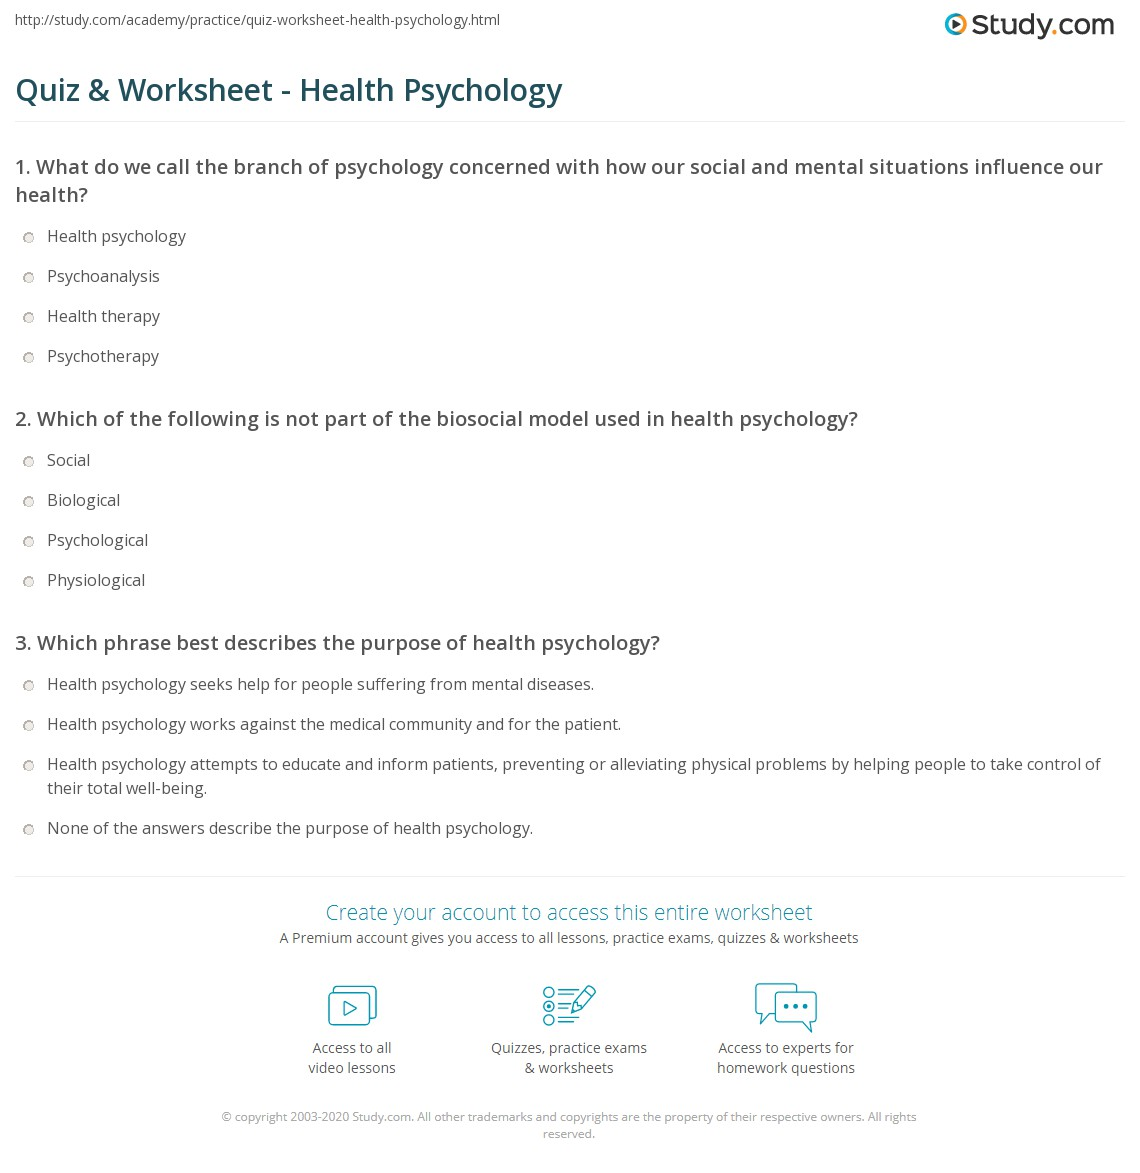 quiz & worksheet - health psychology | study